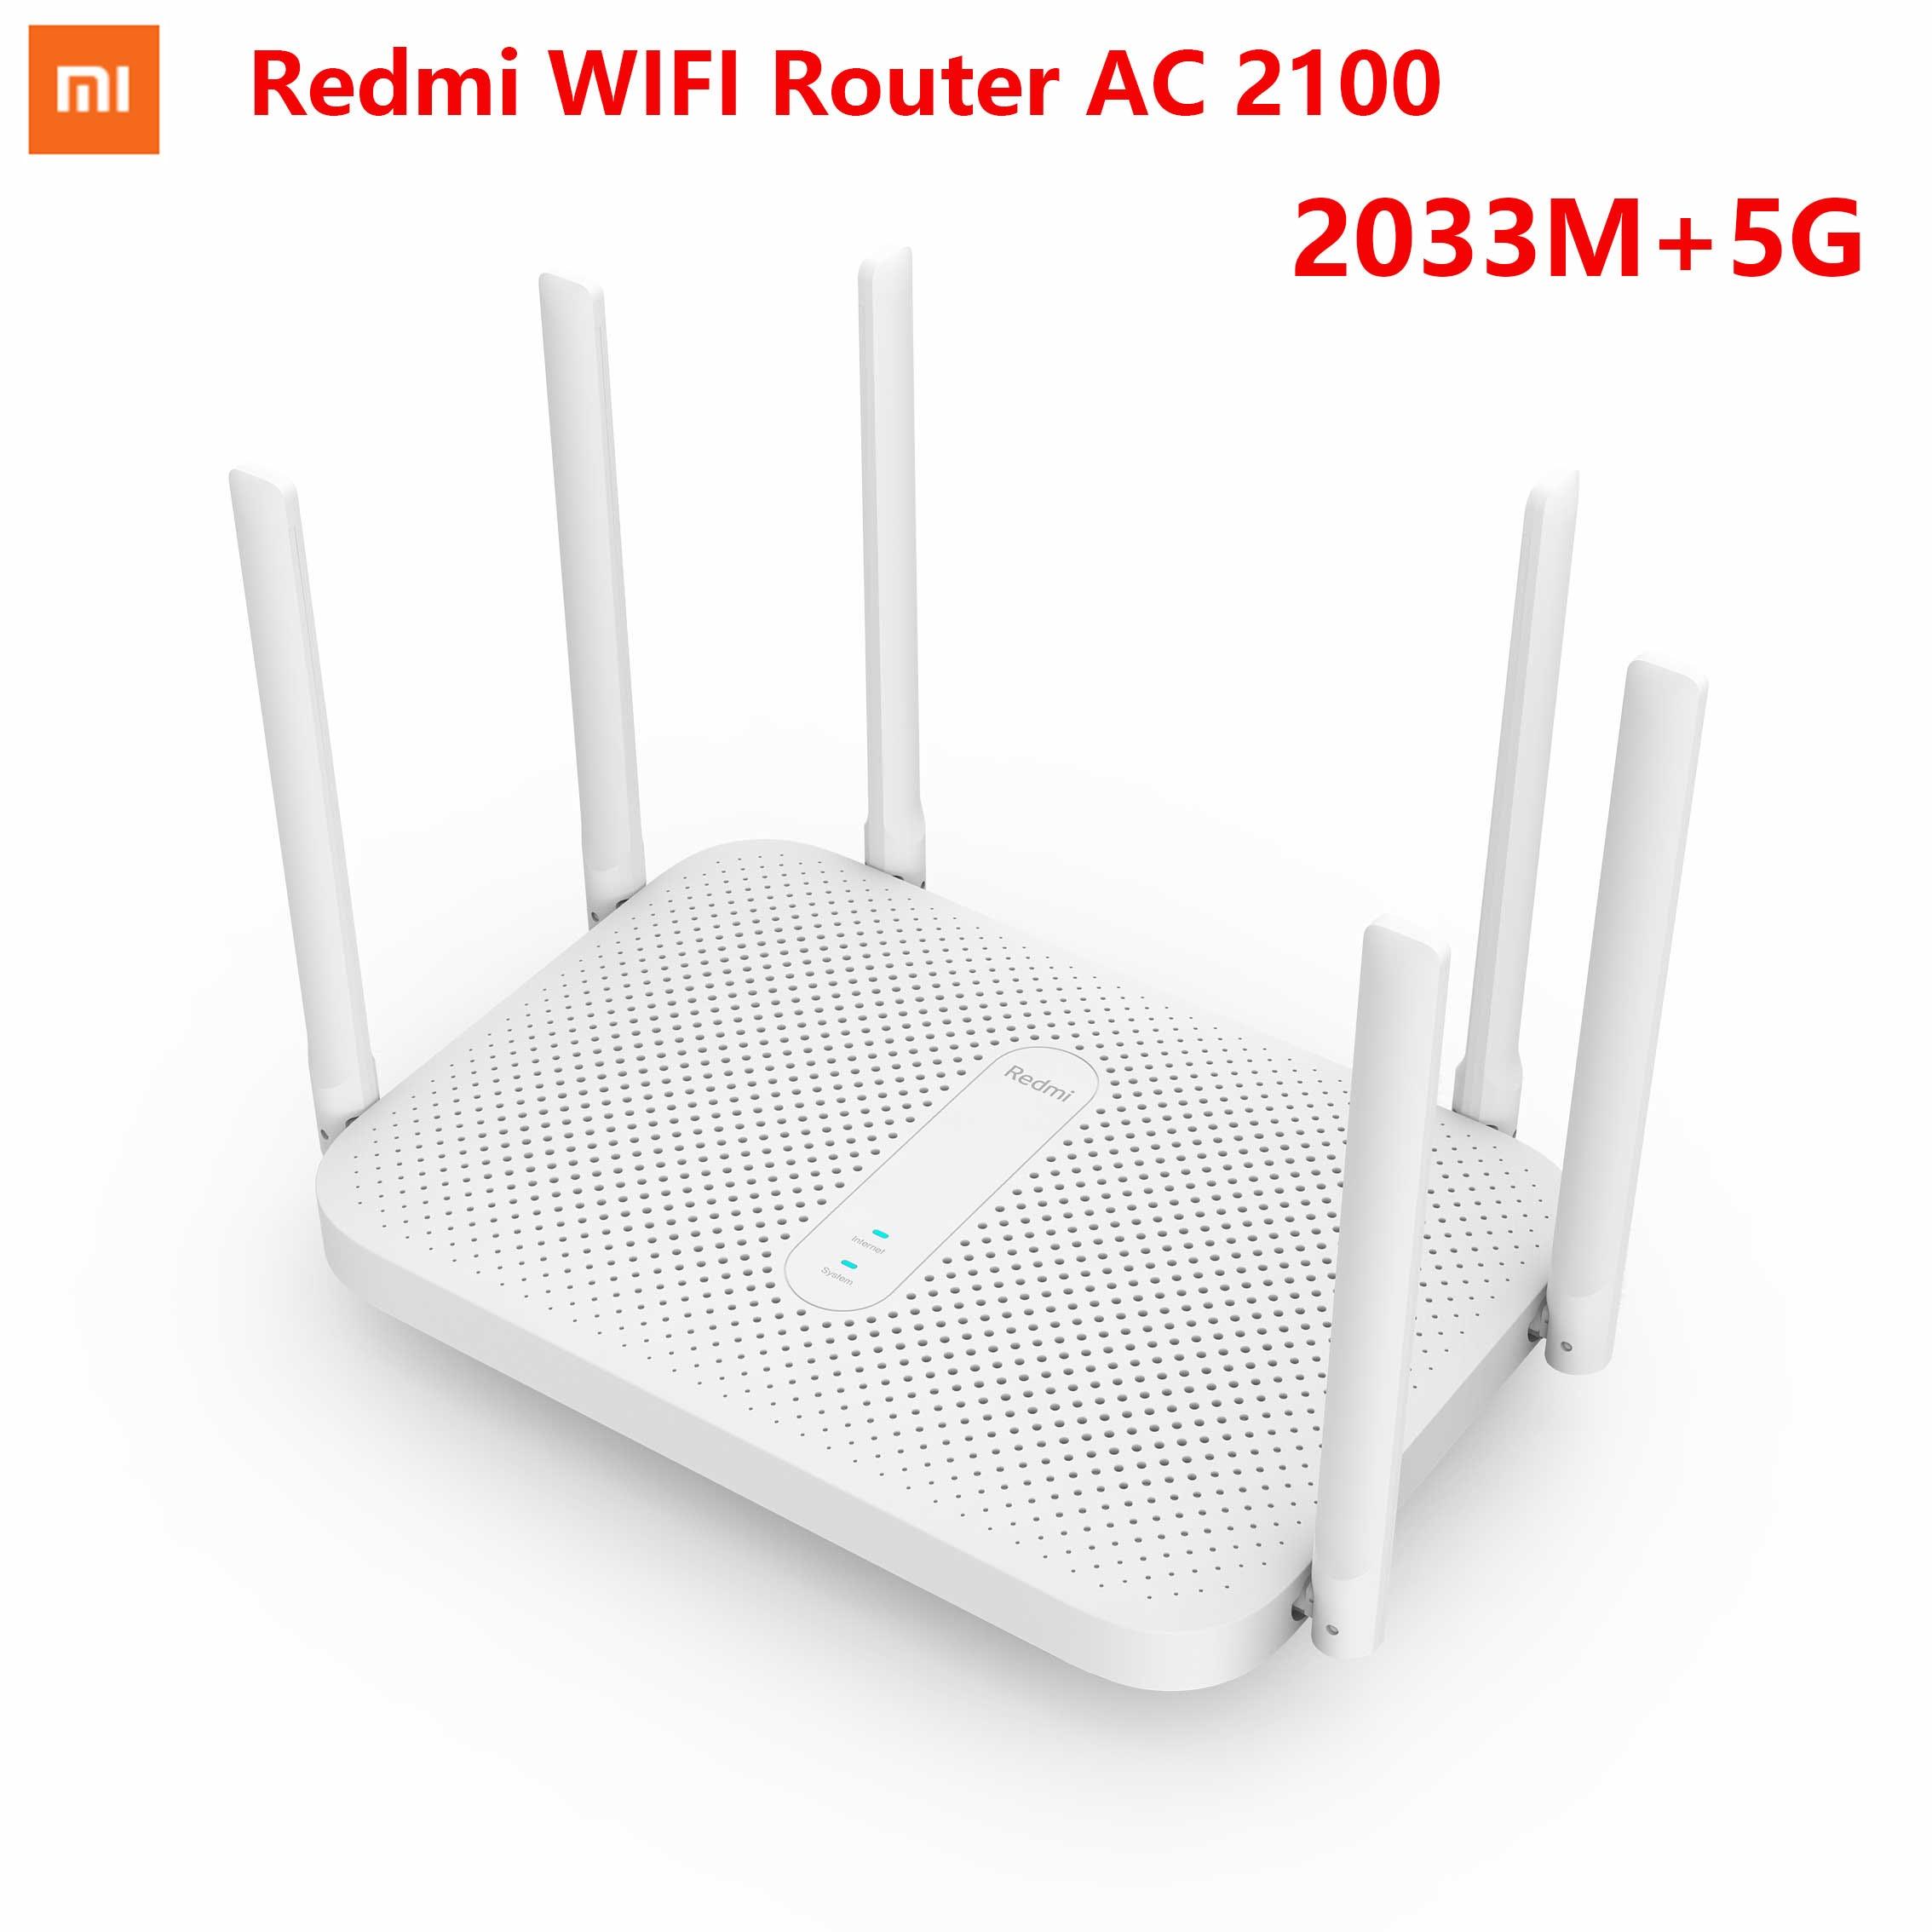 NEUE Xiaomi Redmi Router AX5 WiFi 6 1800 5-Core 256M Speicher Netz Home IoT 4 Signal Verstärker 2,4G 5GHz Sowohl 2 Dual-Band OFDMA 1